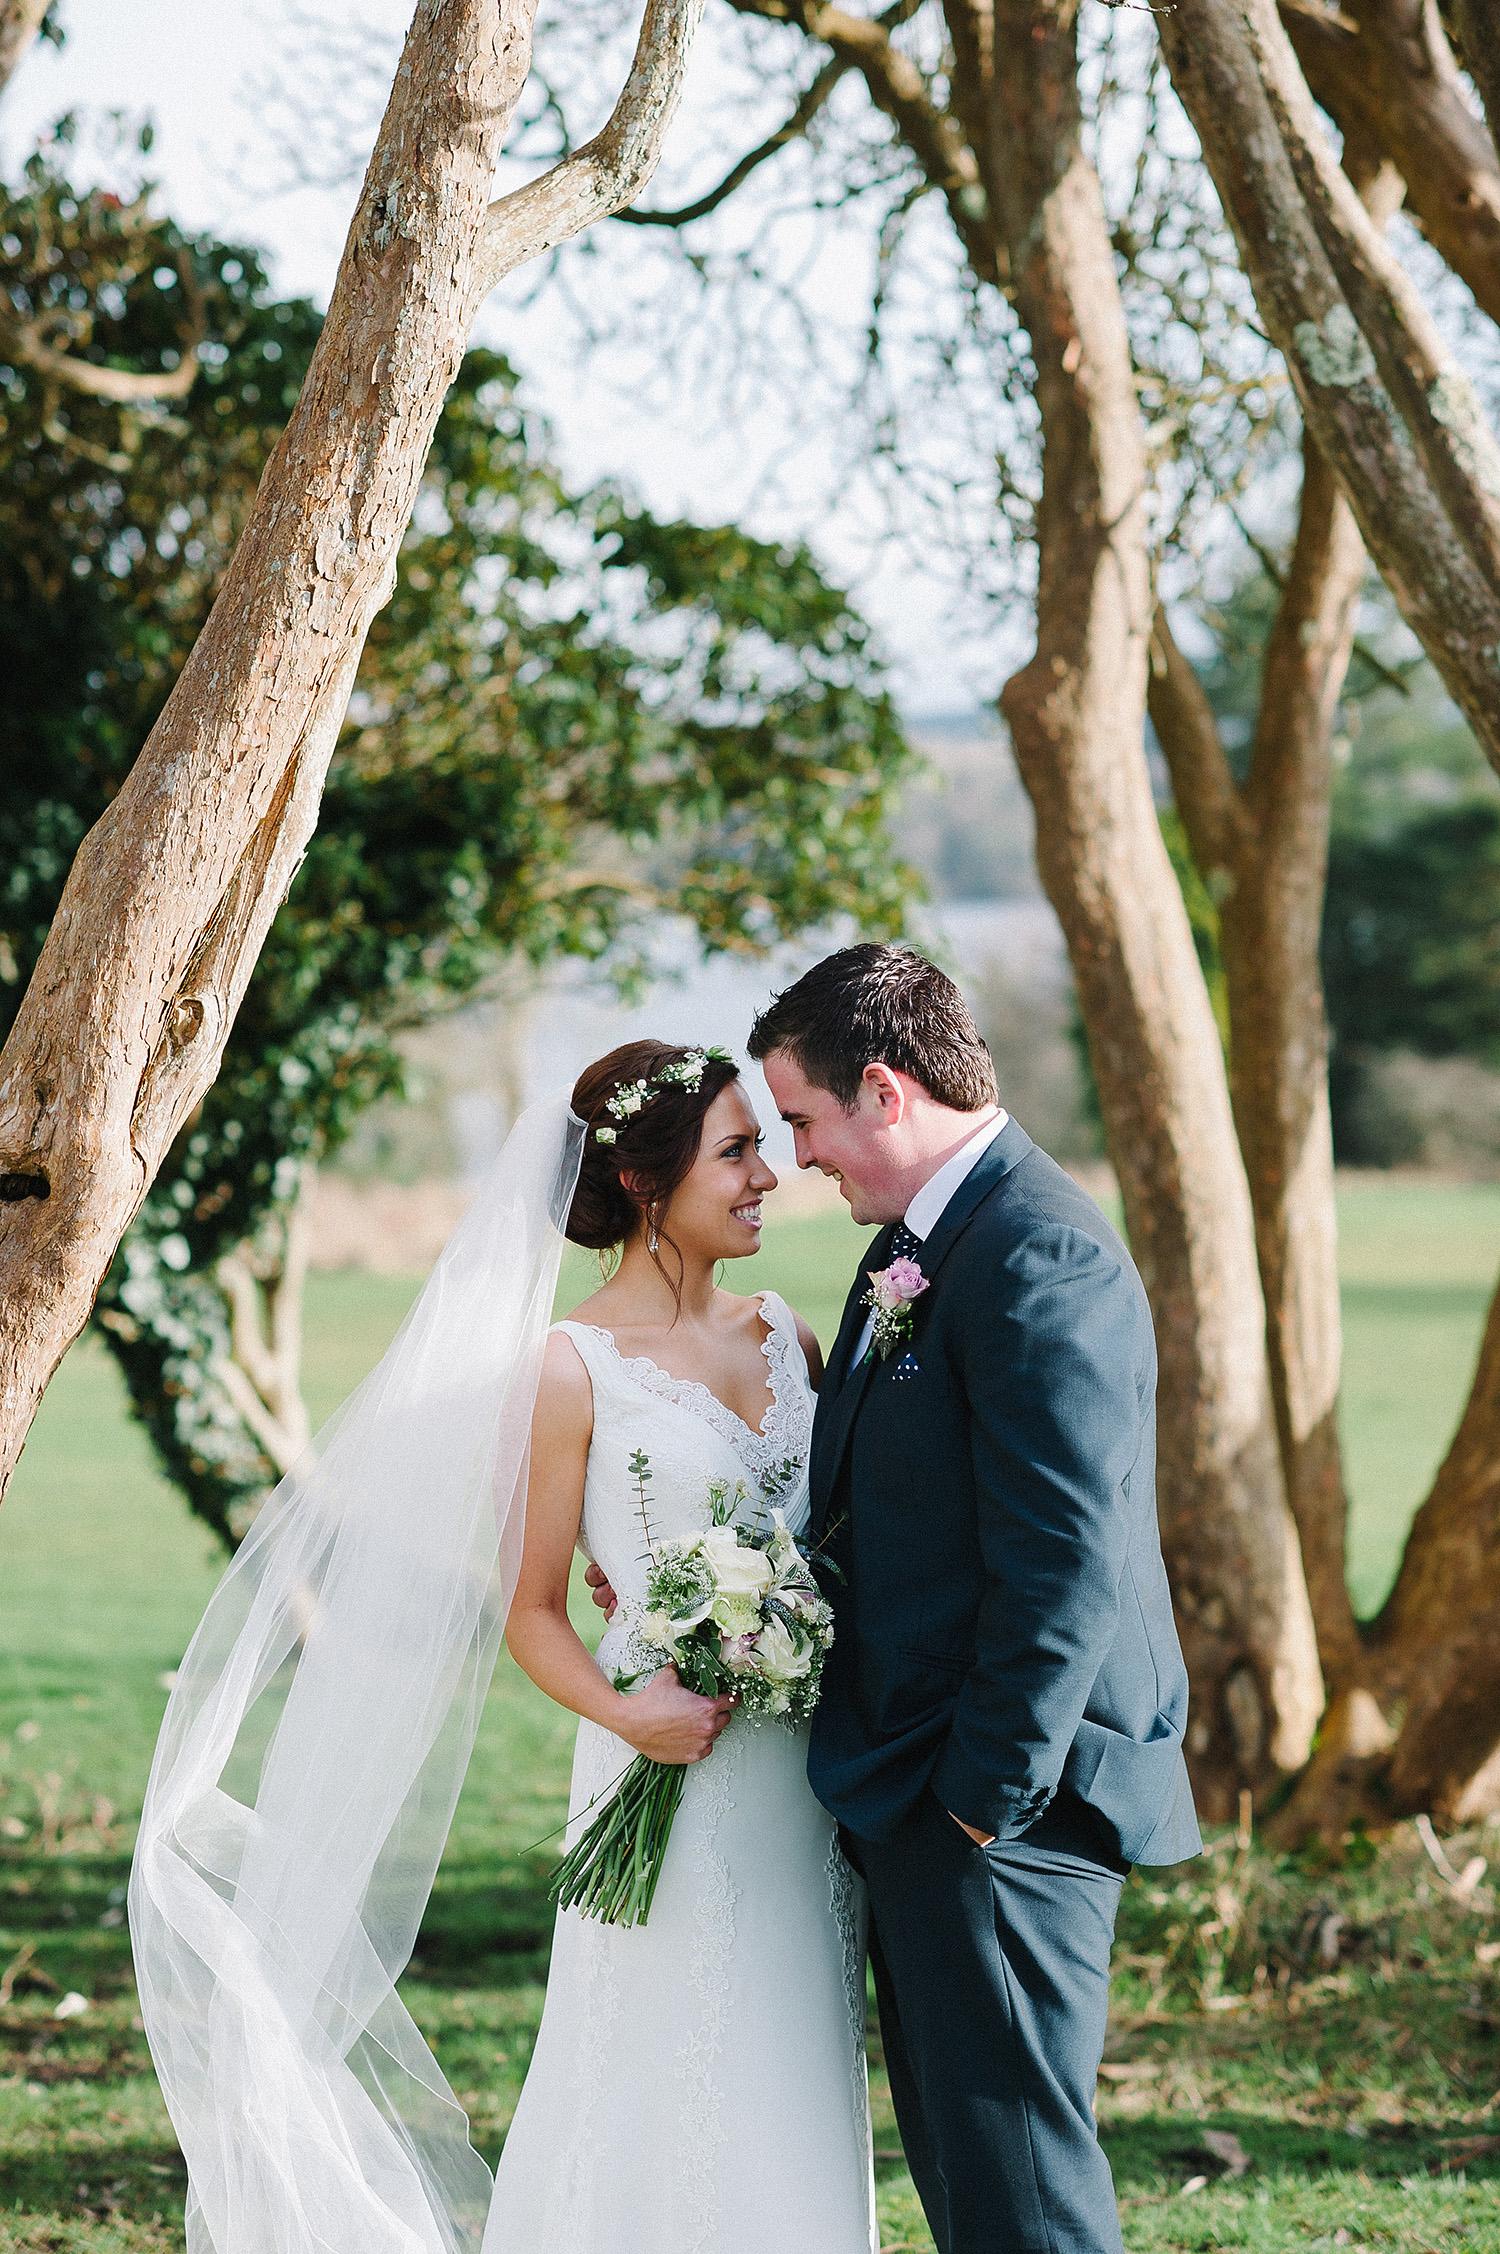 Kilronan Castle Wedding Photography Ireland 088.JPG